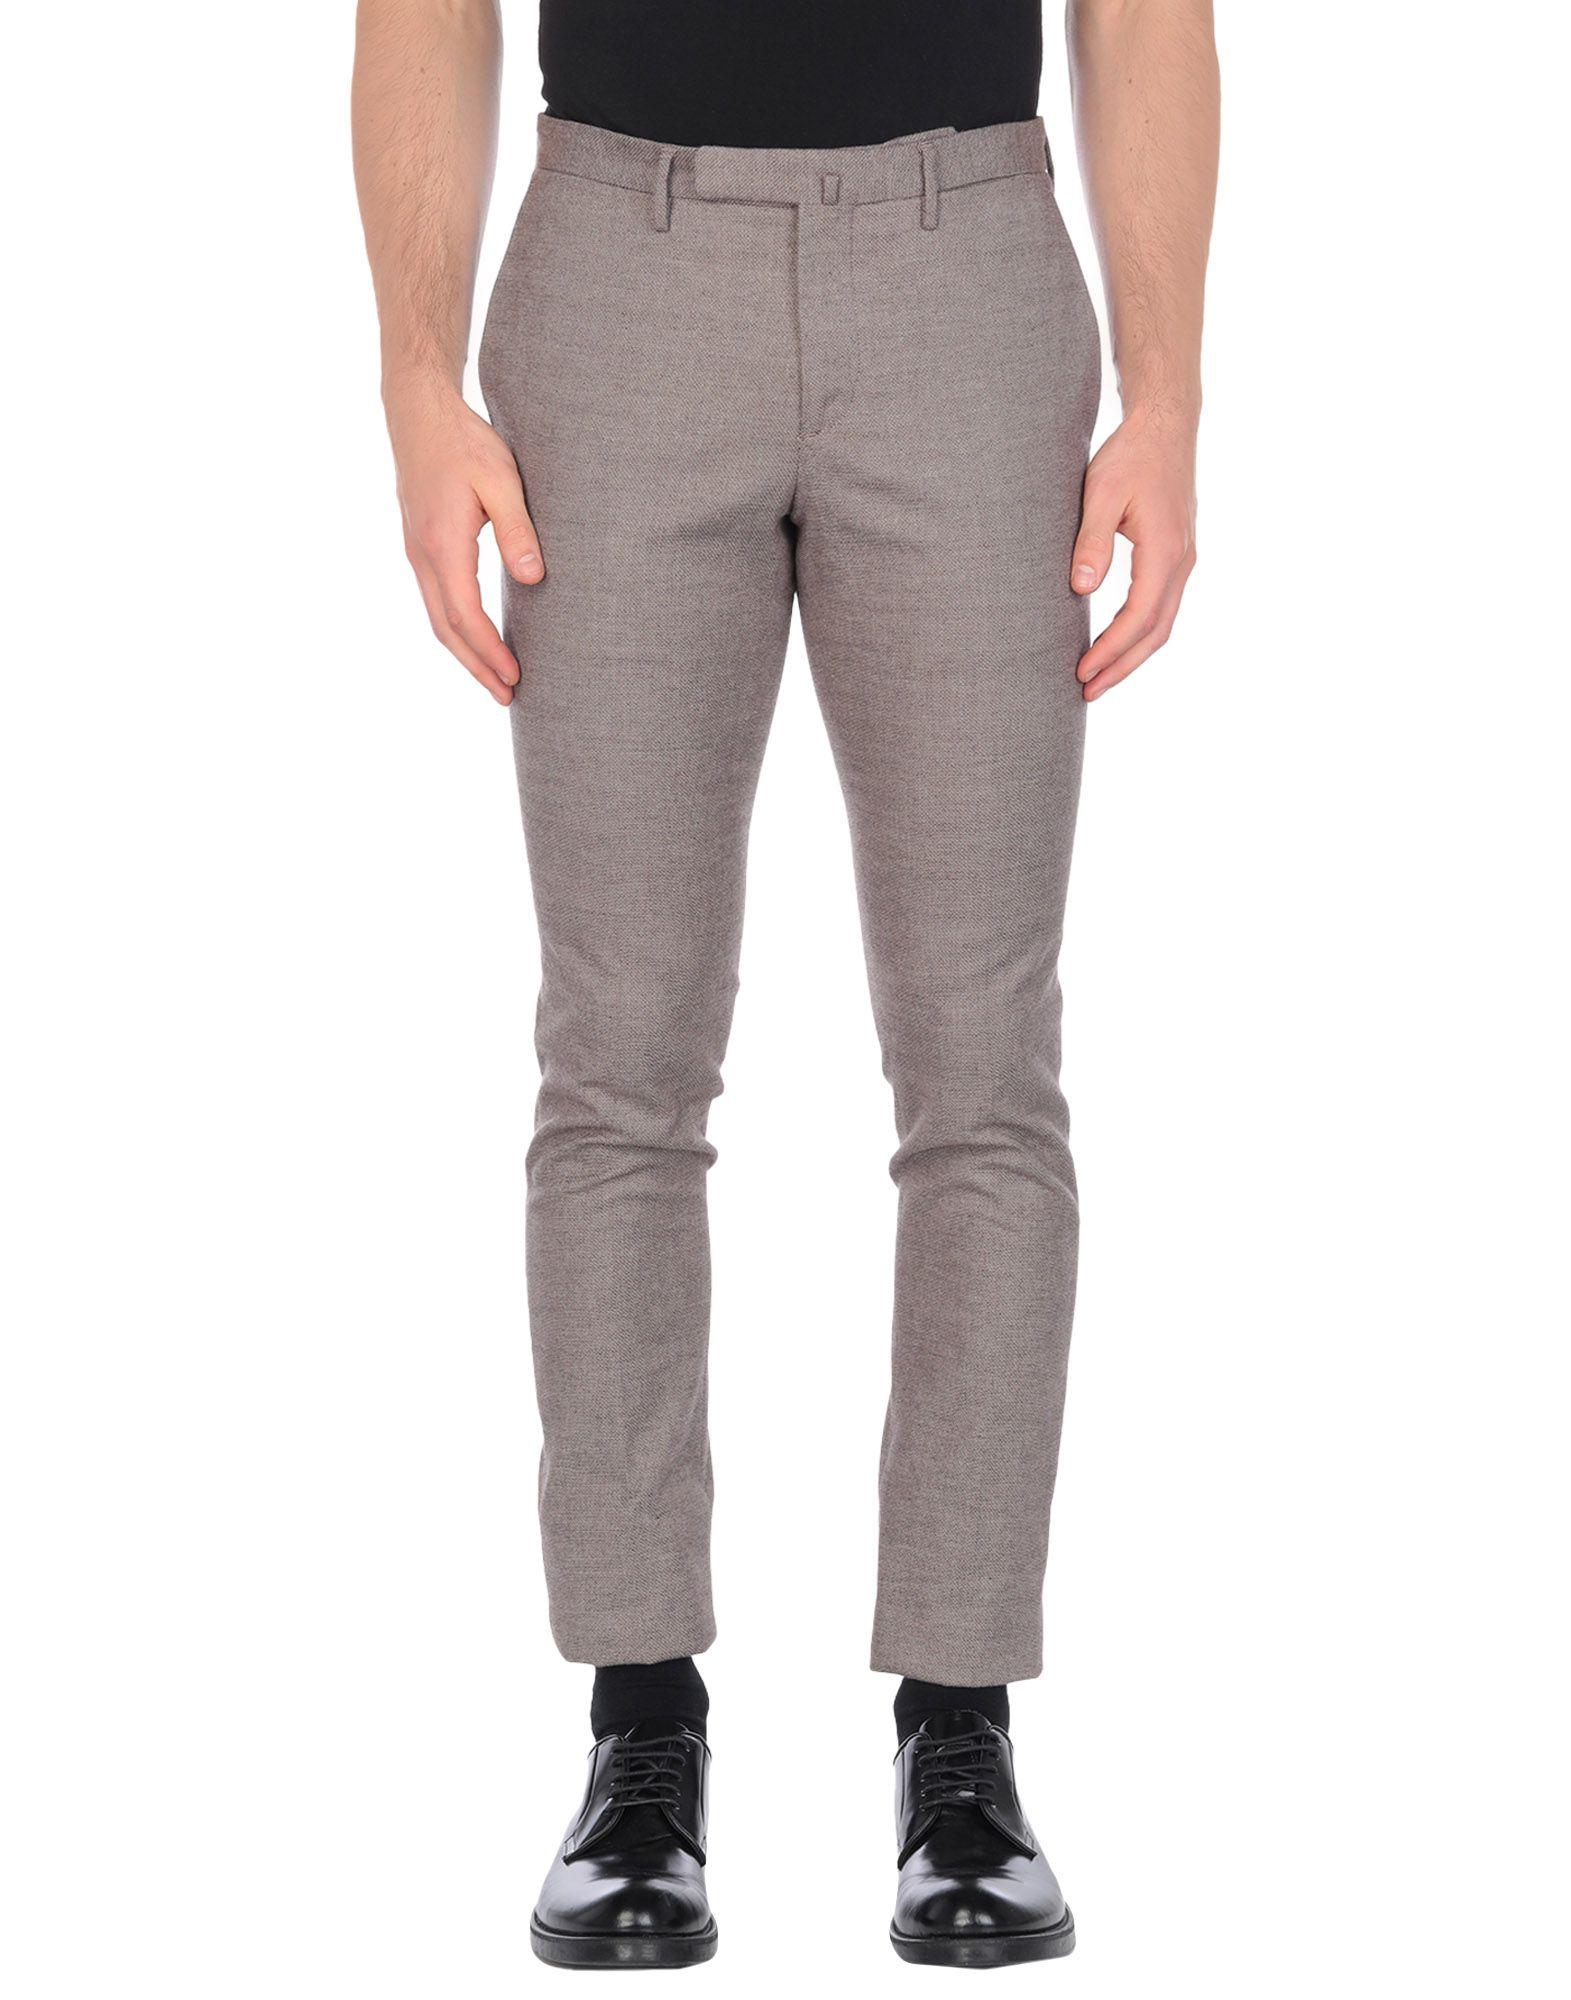 Pantalone Incotex uomo - 36897024VE 36897024VE  die beste Auswahl an